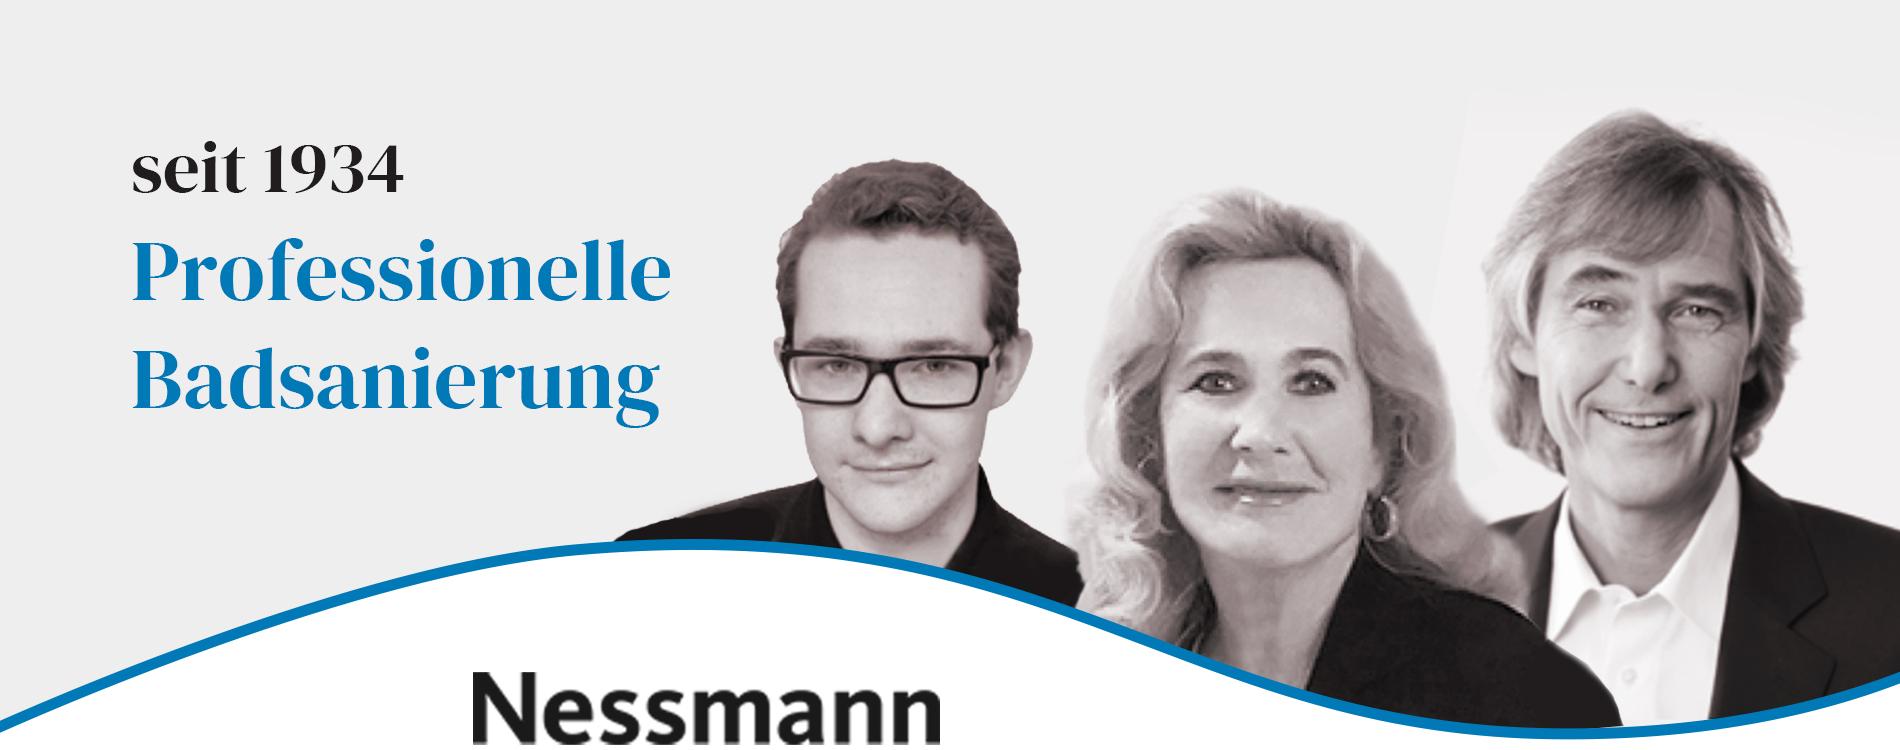 Nessmann Düsseldorf